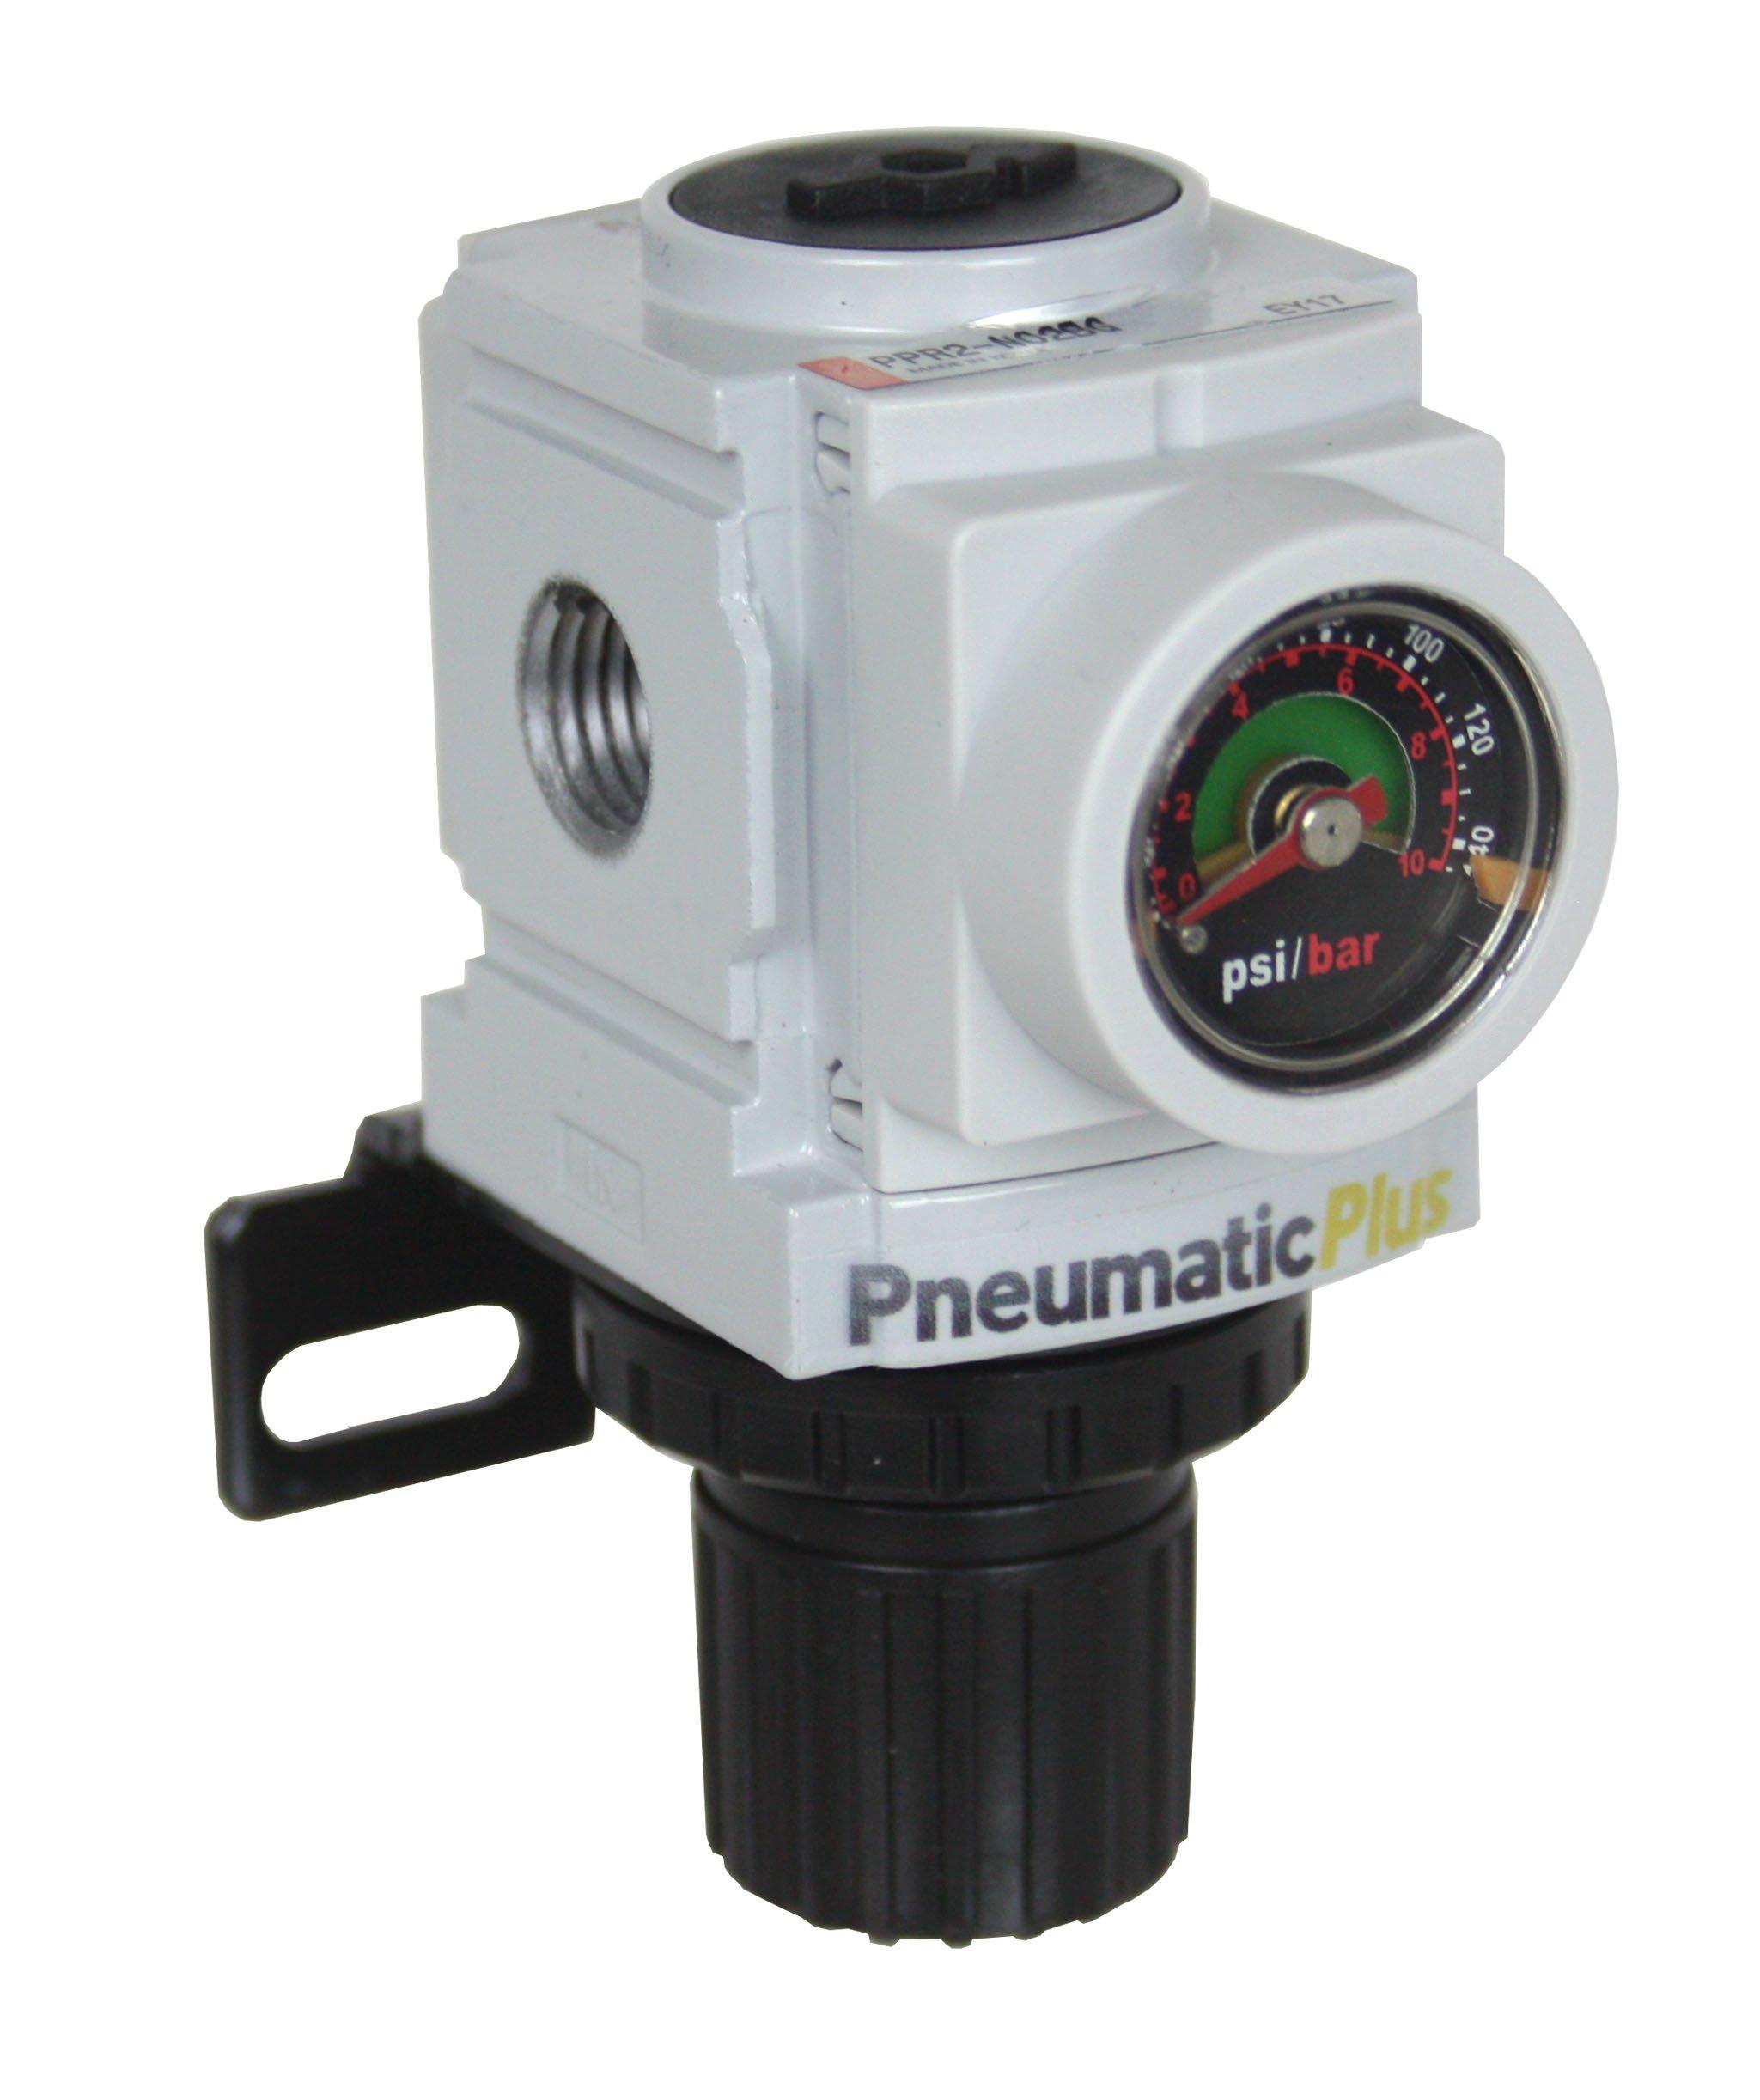 PneumaticPlus PPR2-N02BG Miniature Compressed Air Pressure Regulator 1/4'' NPT - Embedded Gauge, Bracket by PneumaticPlus